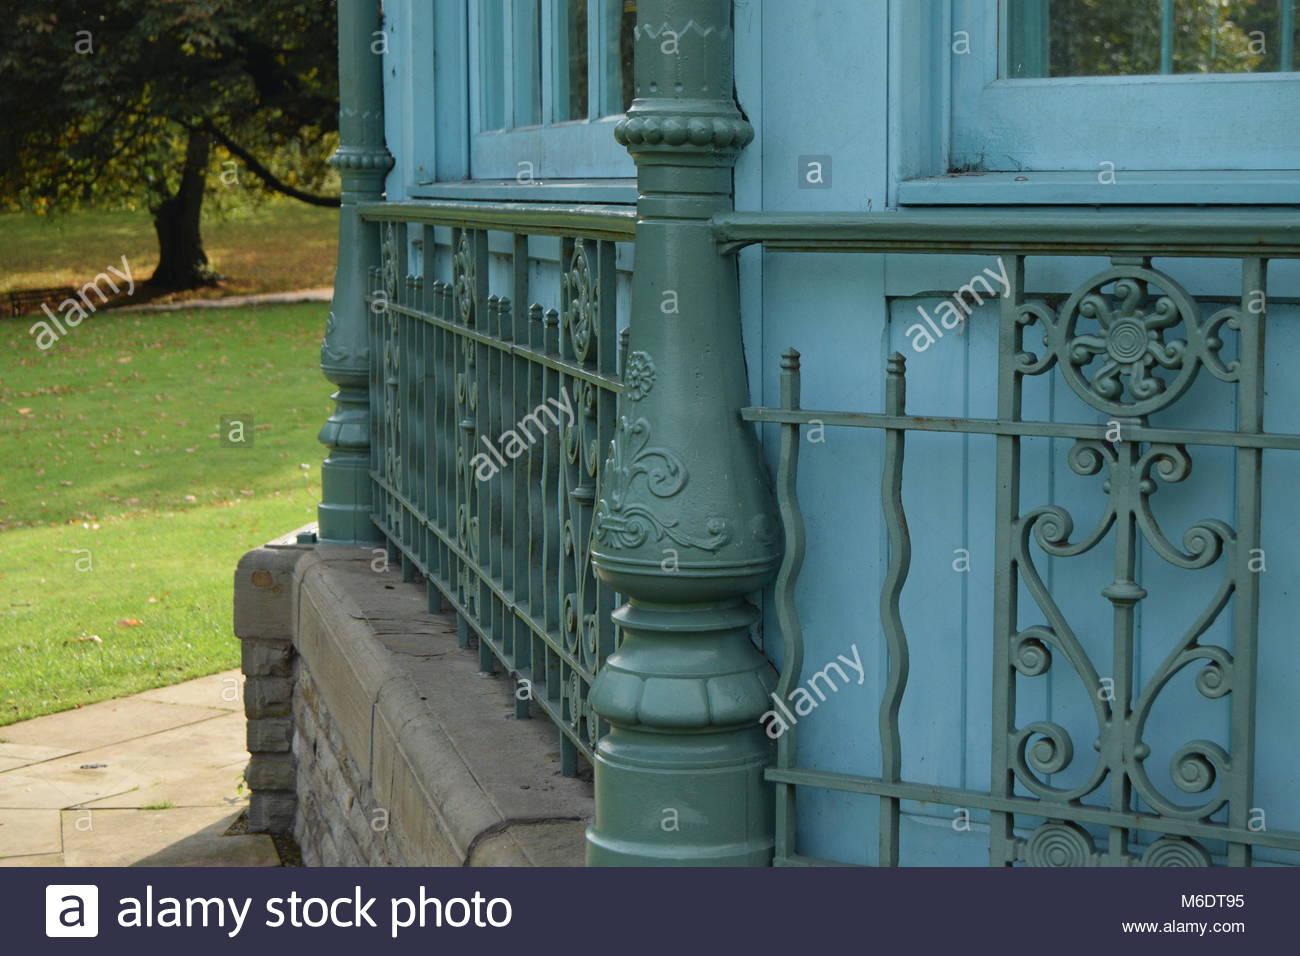 Weston park Bandstand - Stock Image